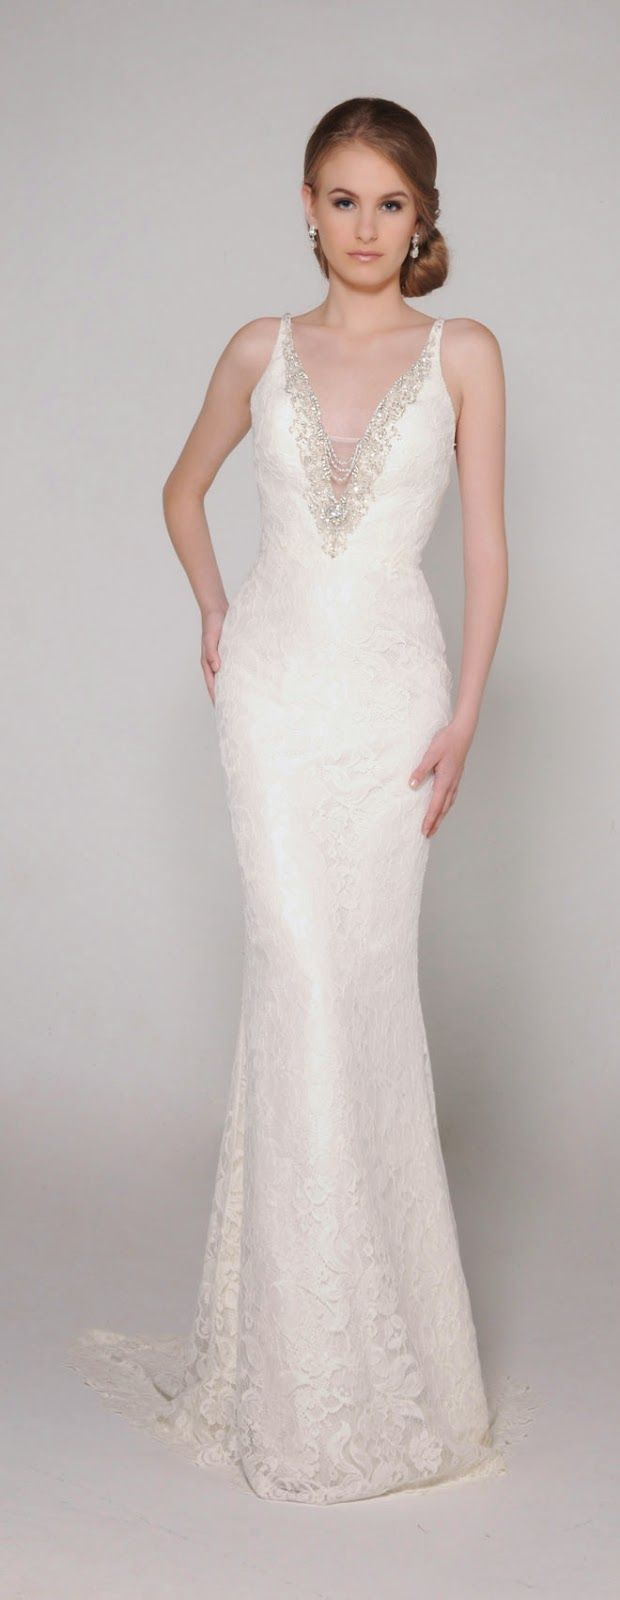 Wedding Dresses by Eugenia Couture Fall 2015   bellethemagazine.com